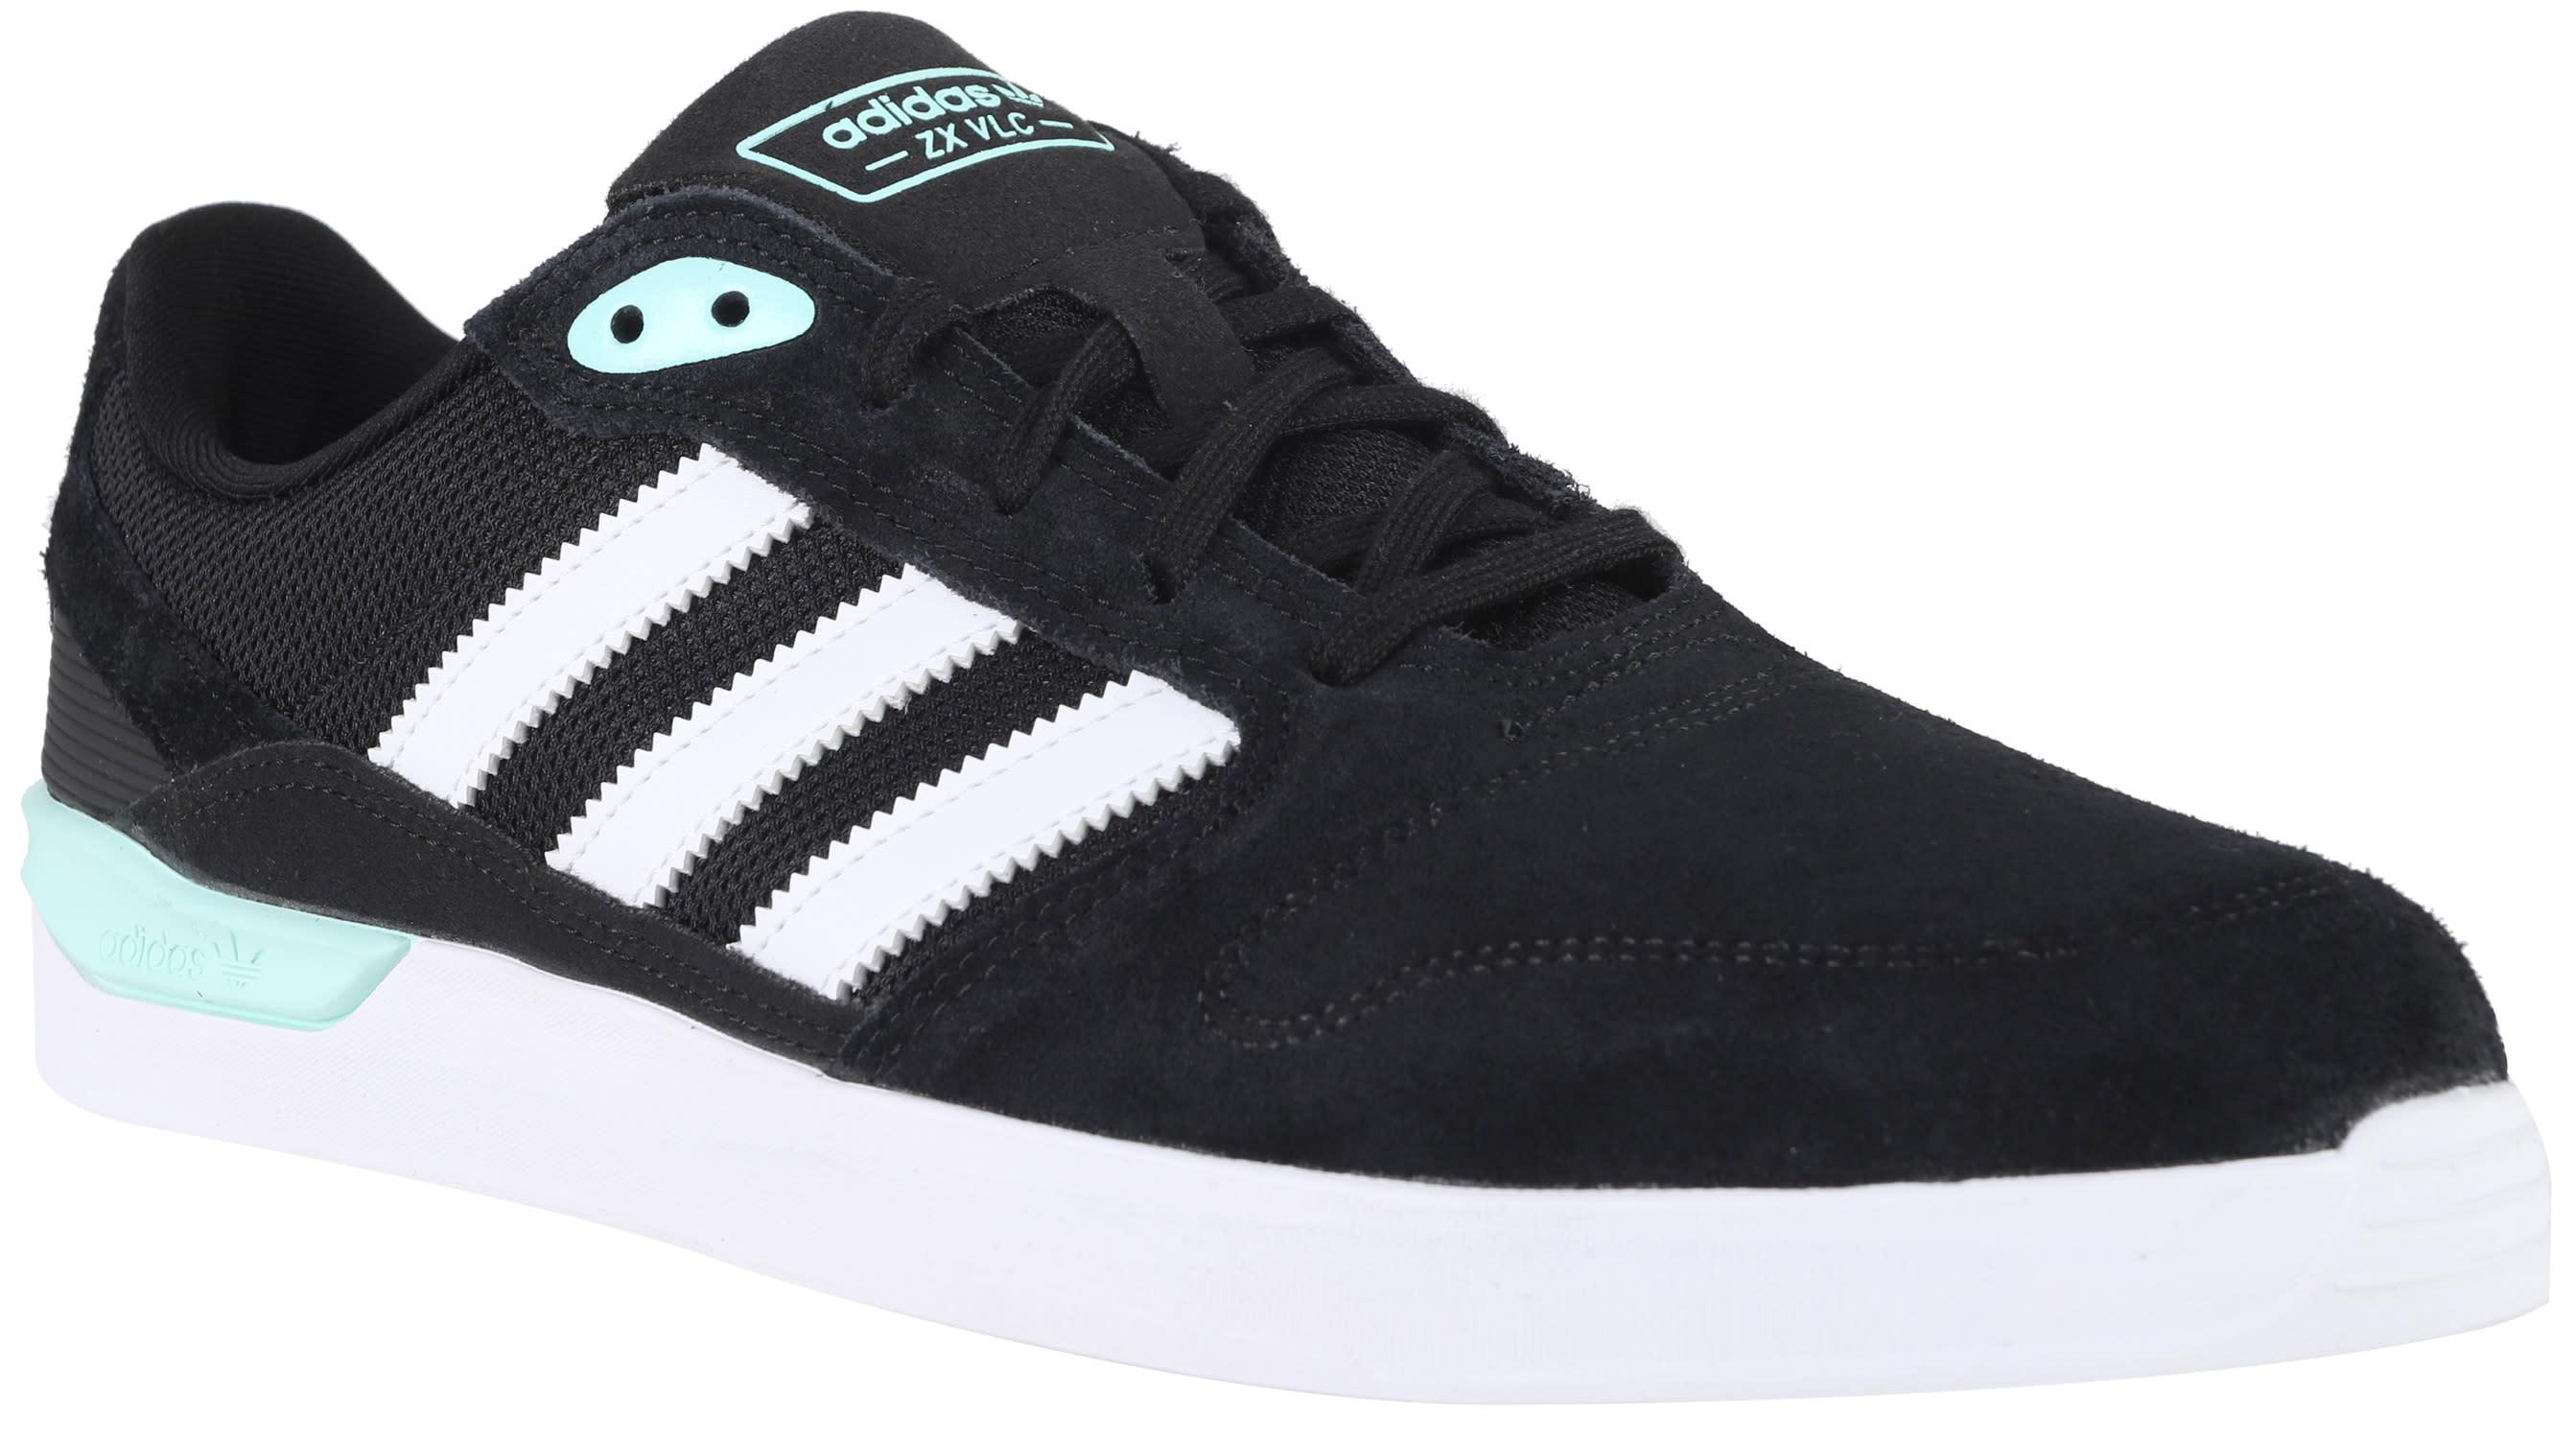 deba9654918f1 Adidas ZX Vulc Skate Shoes - thumbnail 2